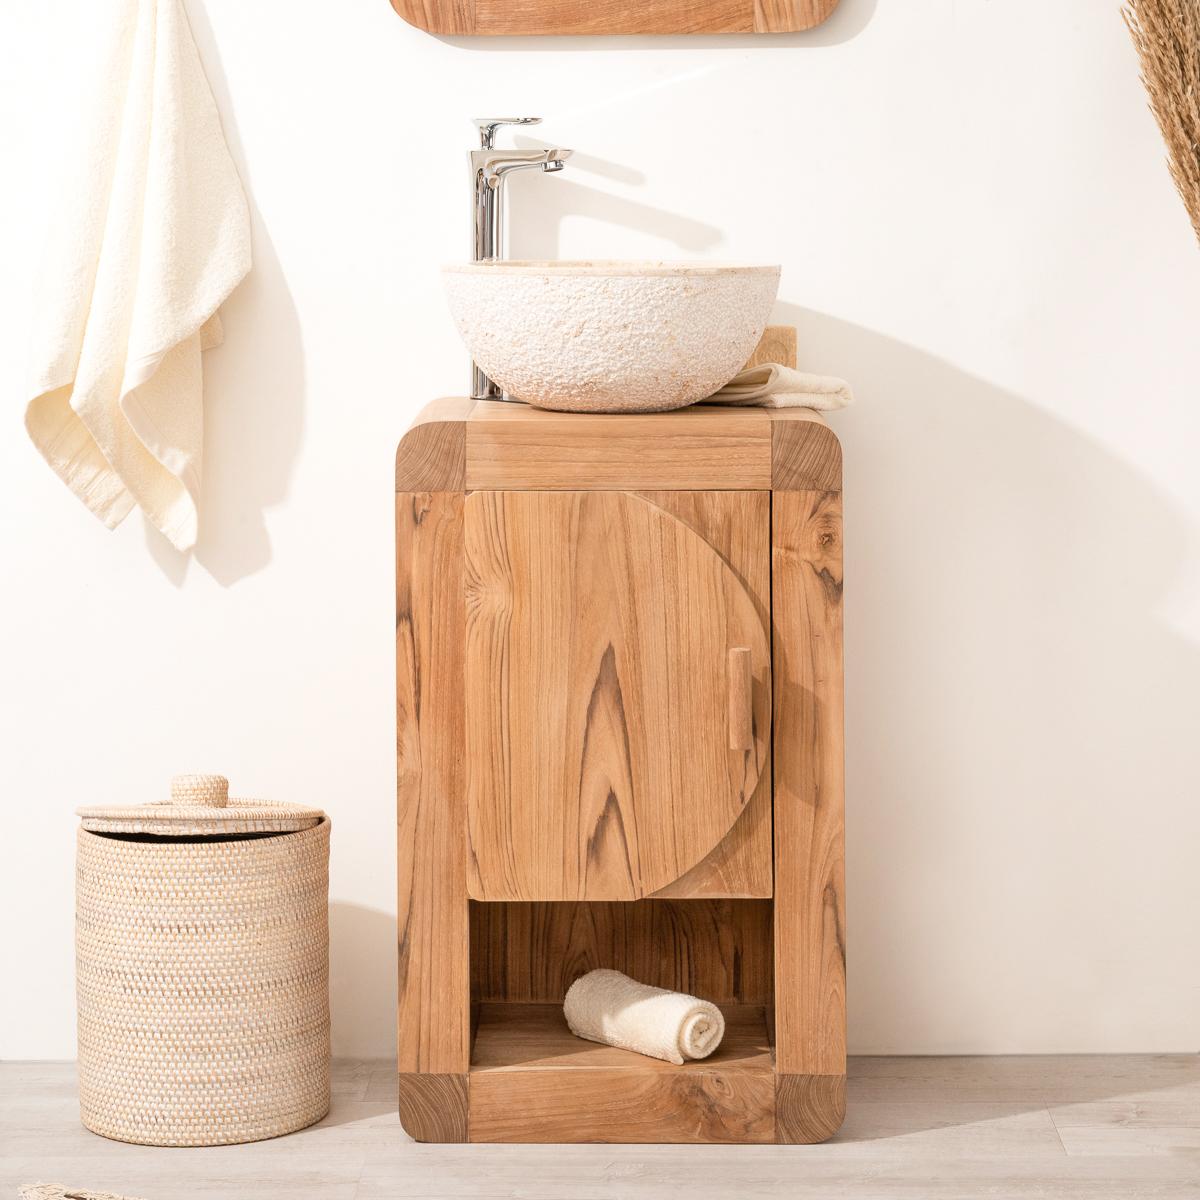 Mueble para lavabo simple de madera teca maciza for Muebles de bano de madera maciza natural